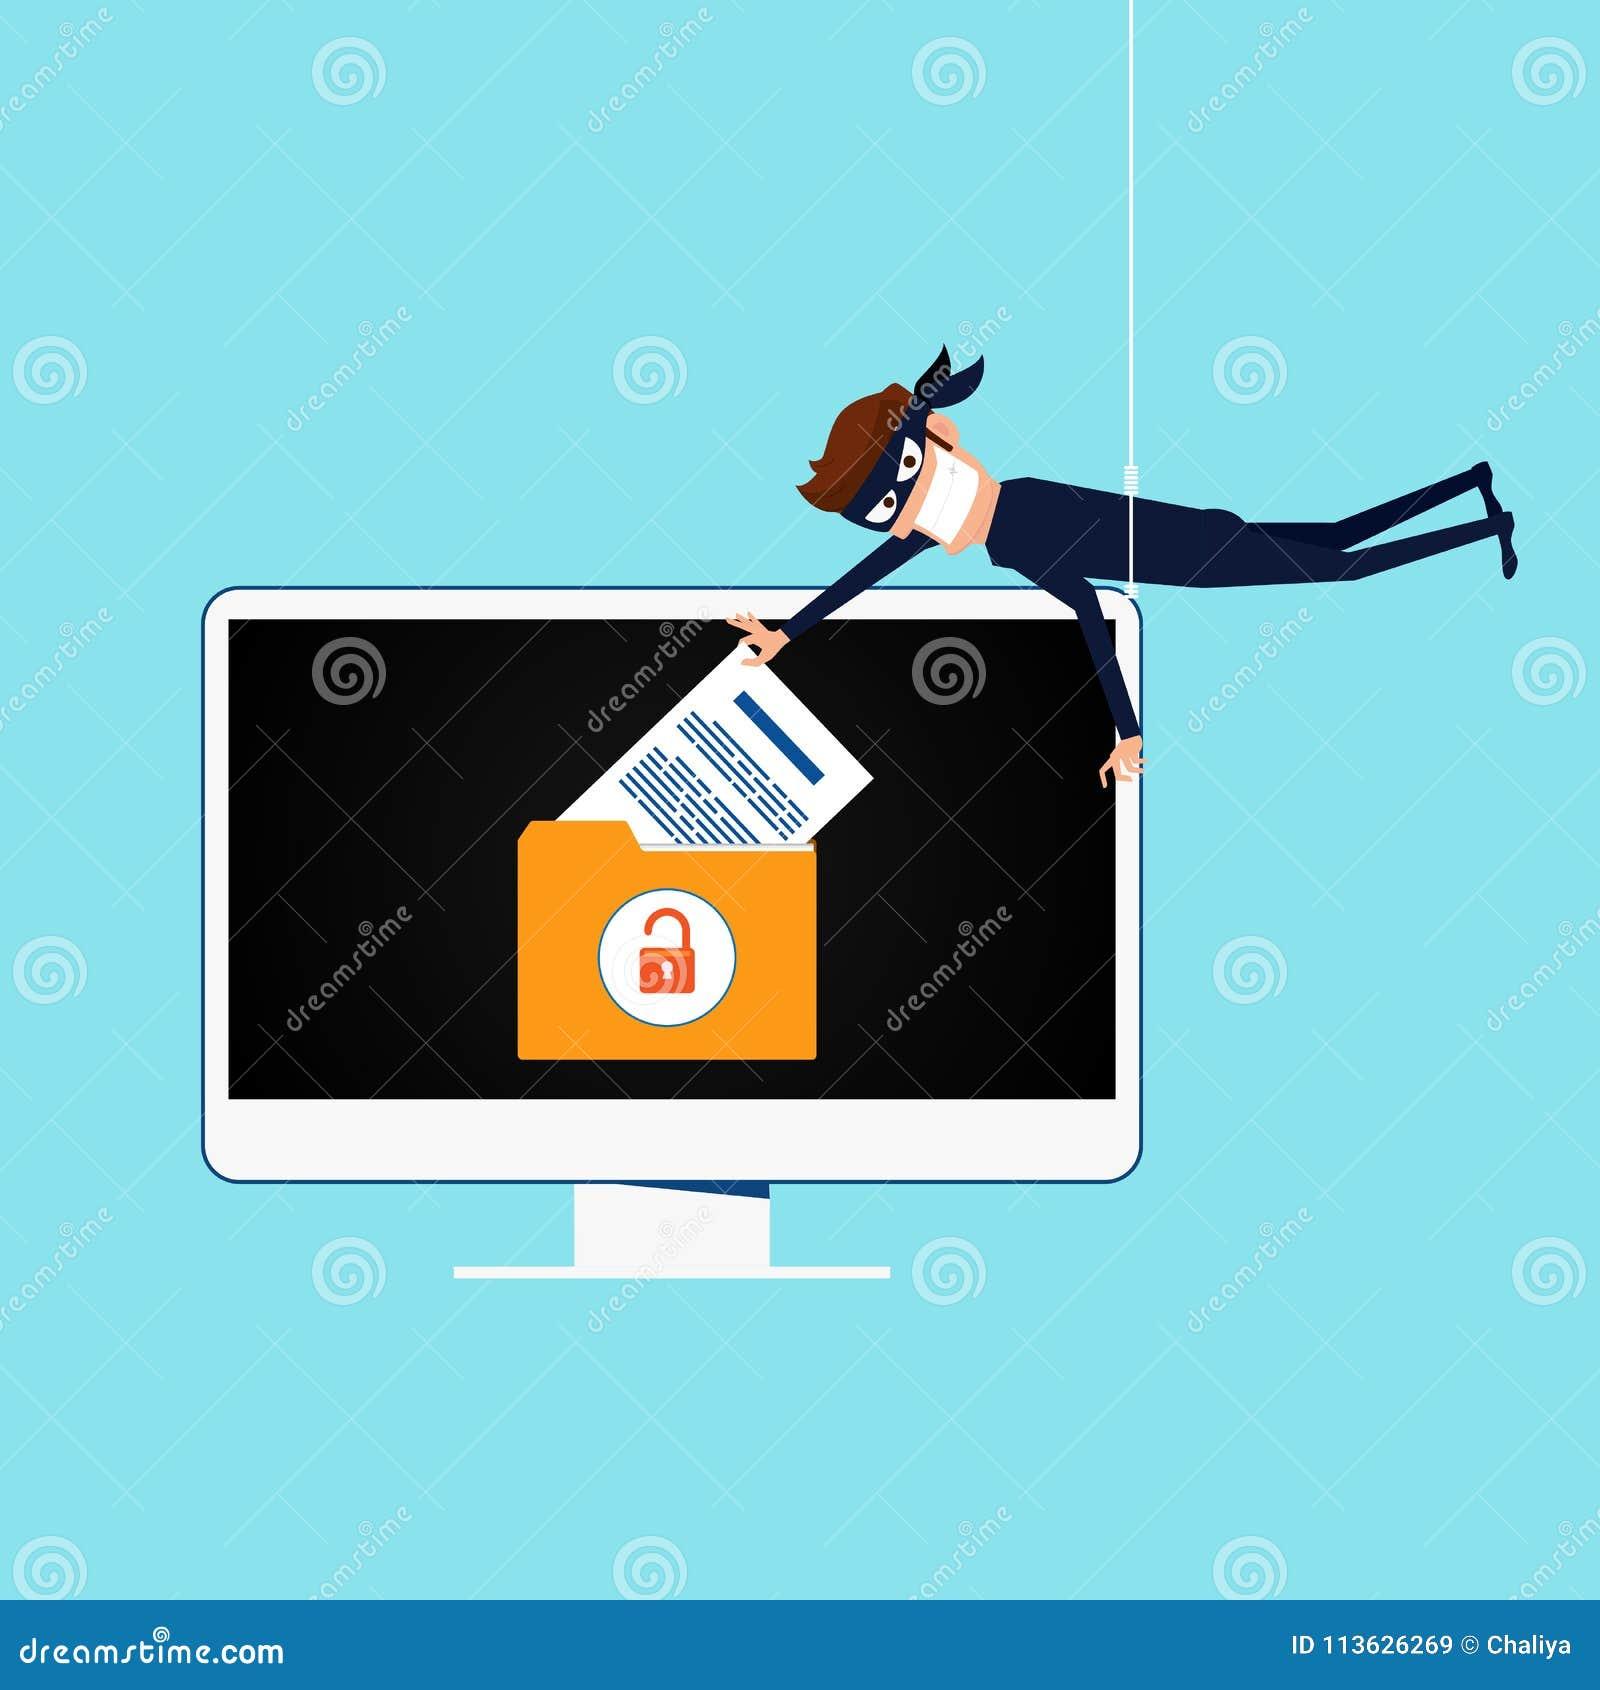 Thief  Hacker Stealing Sensitive Data As Passwords From A